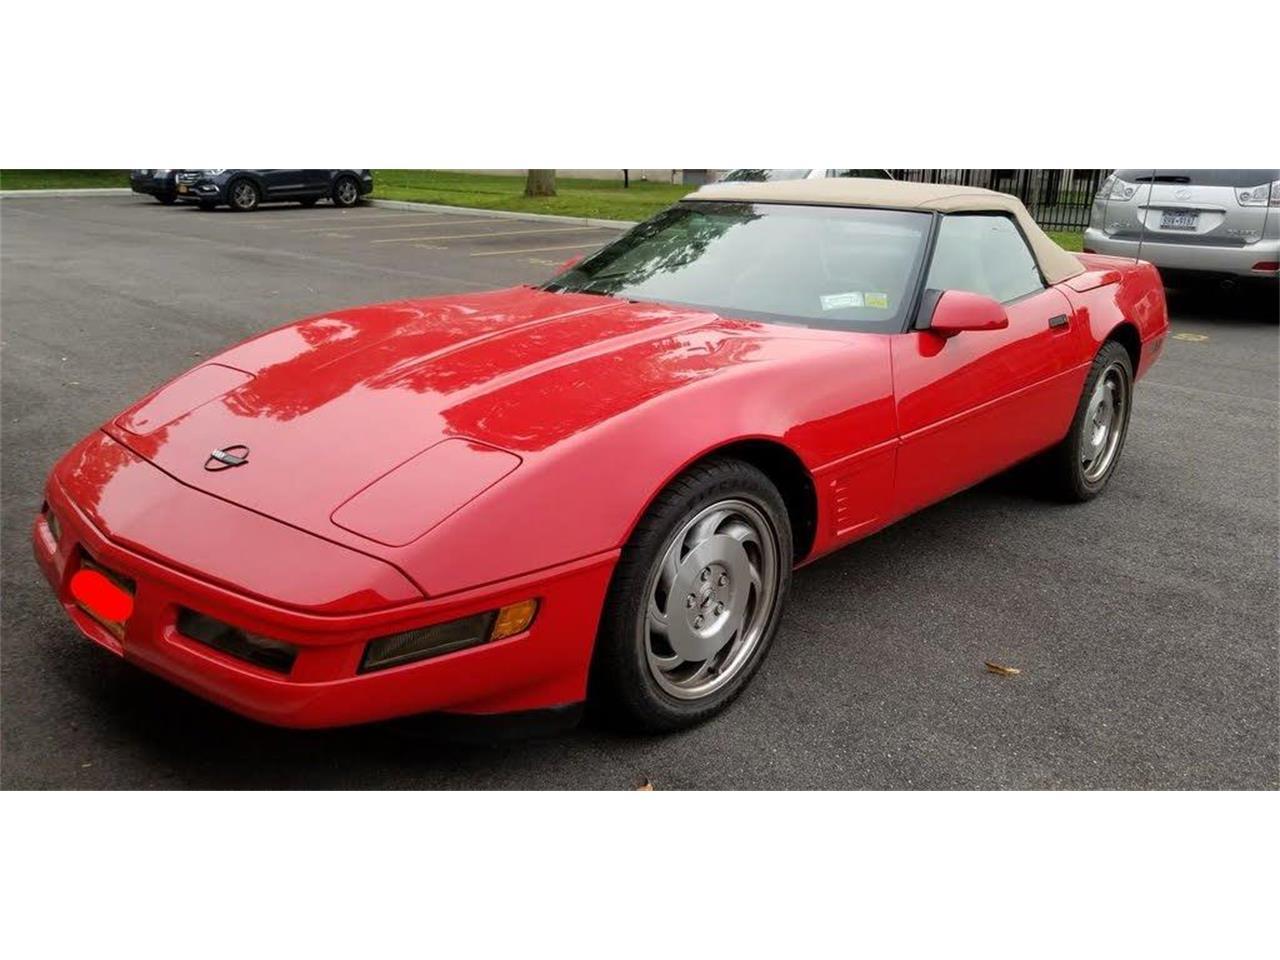 1996 Chevrolet Corvette (CC-1273032) for sale in Great Neck, New York